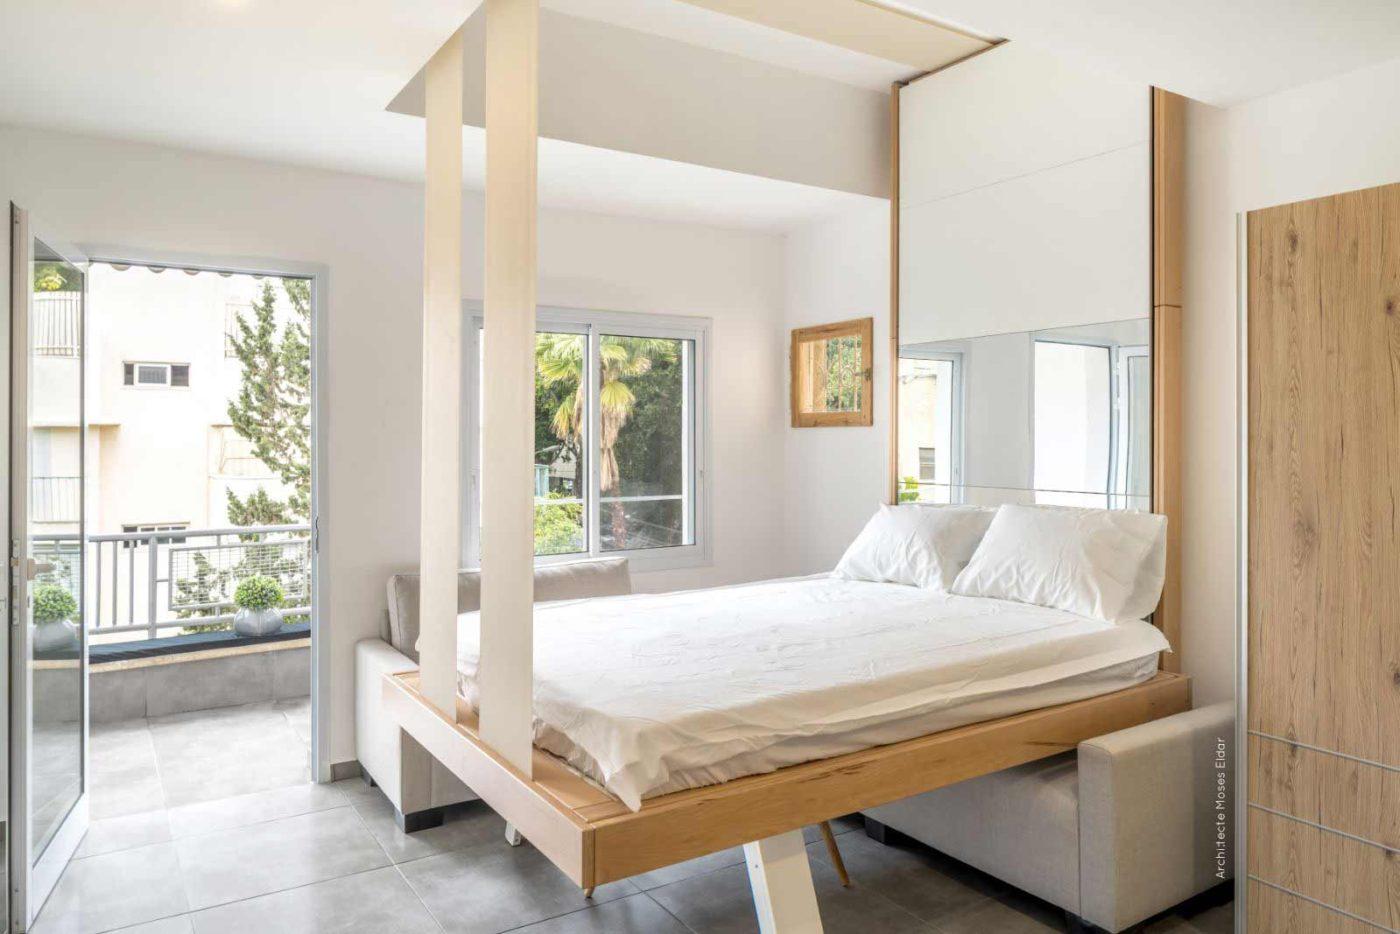 architecte m eldar lit au plafond - Lit Plafond